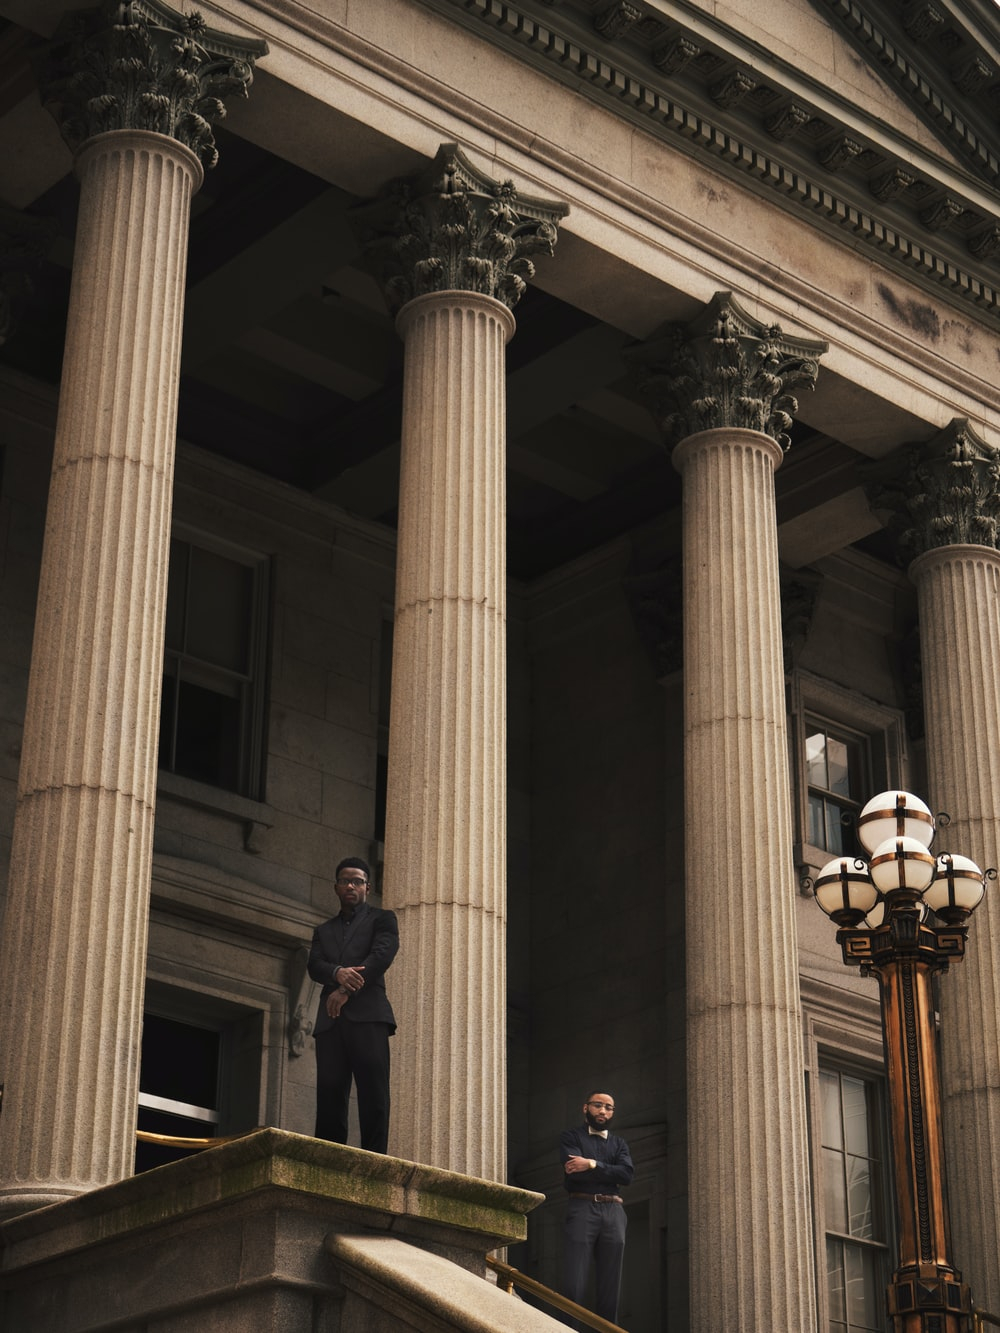 two men standing on Corinthian column building